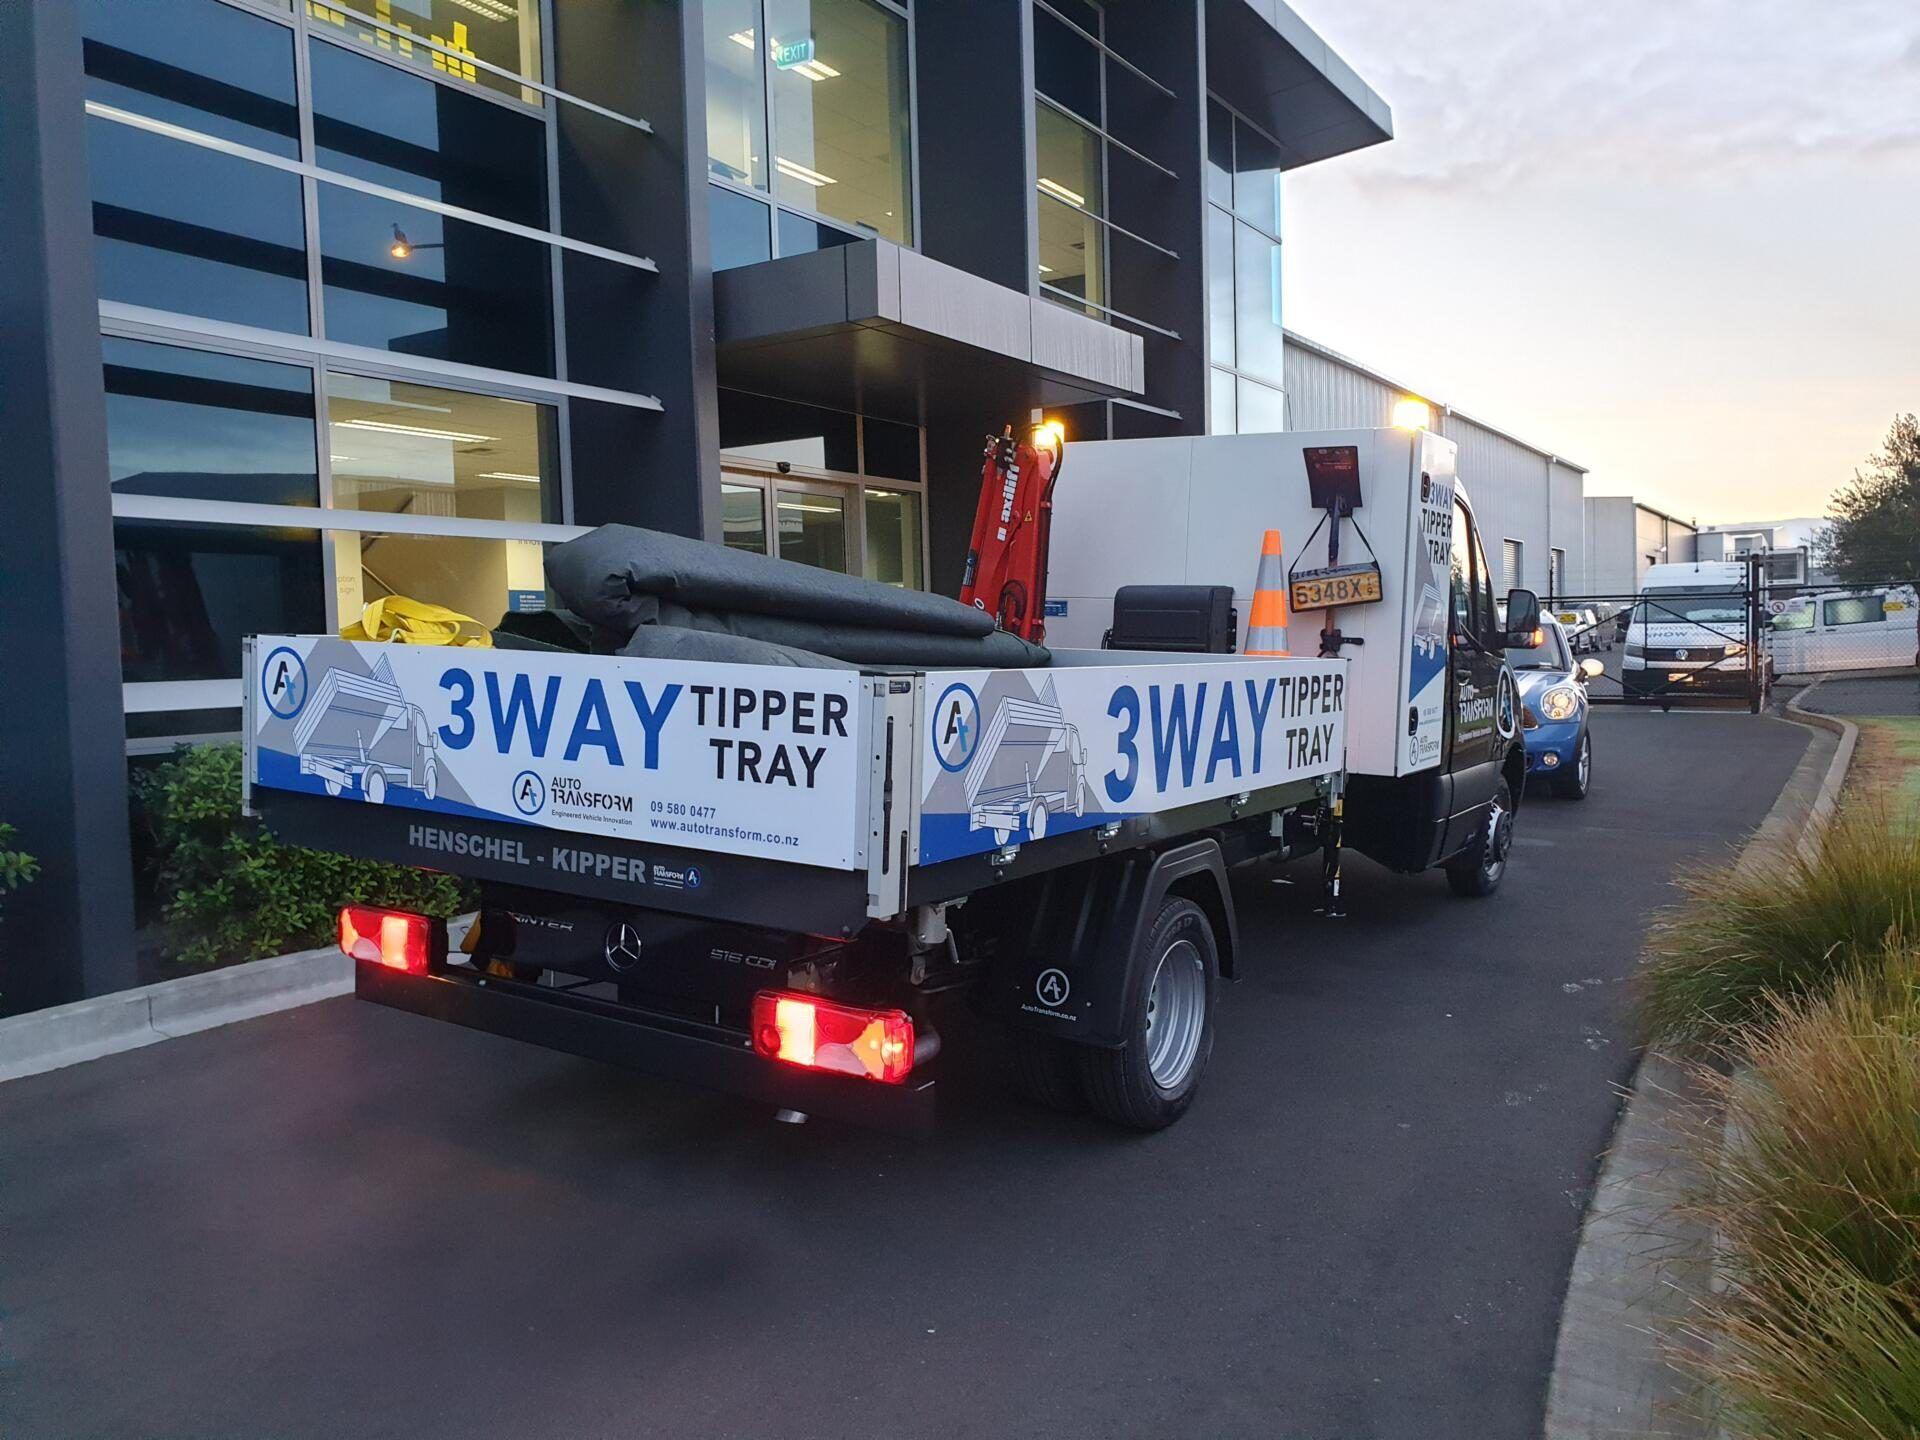 fleet branding vehicle signage for auto transform way tipper